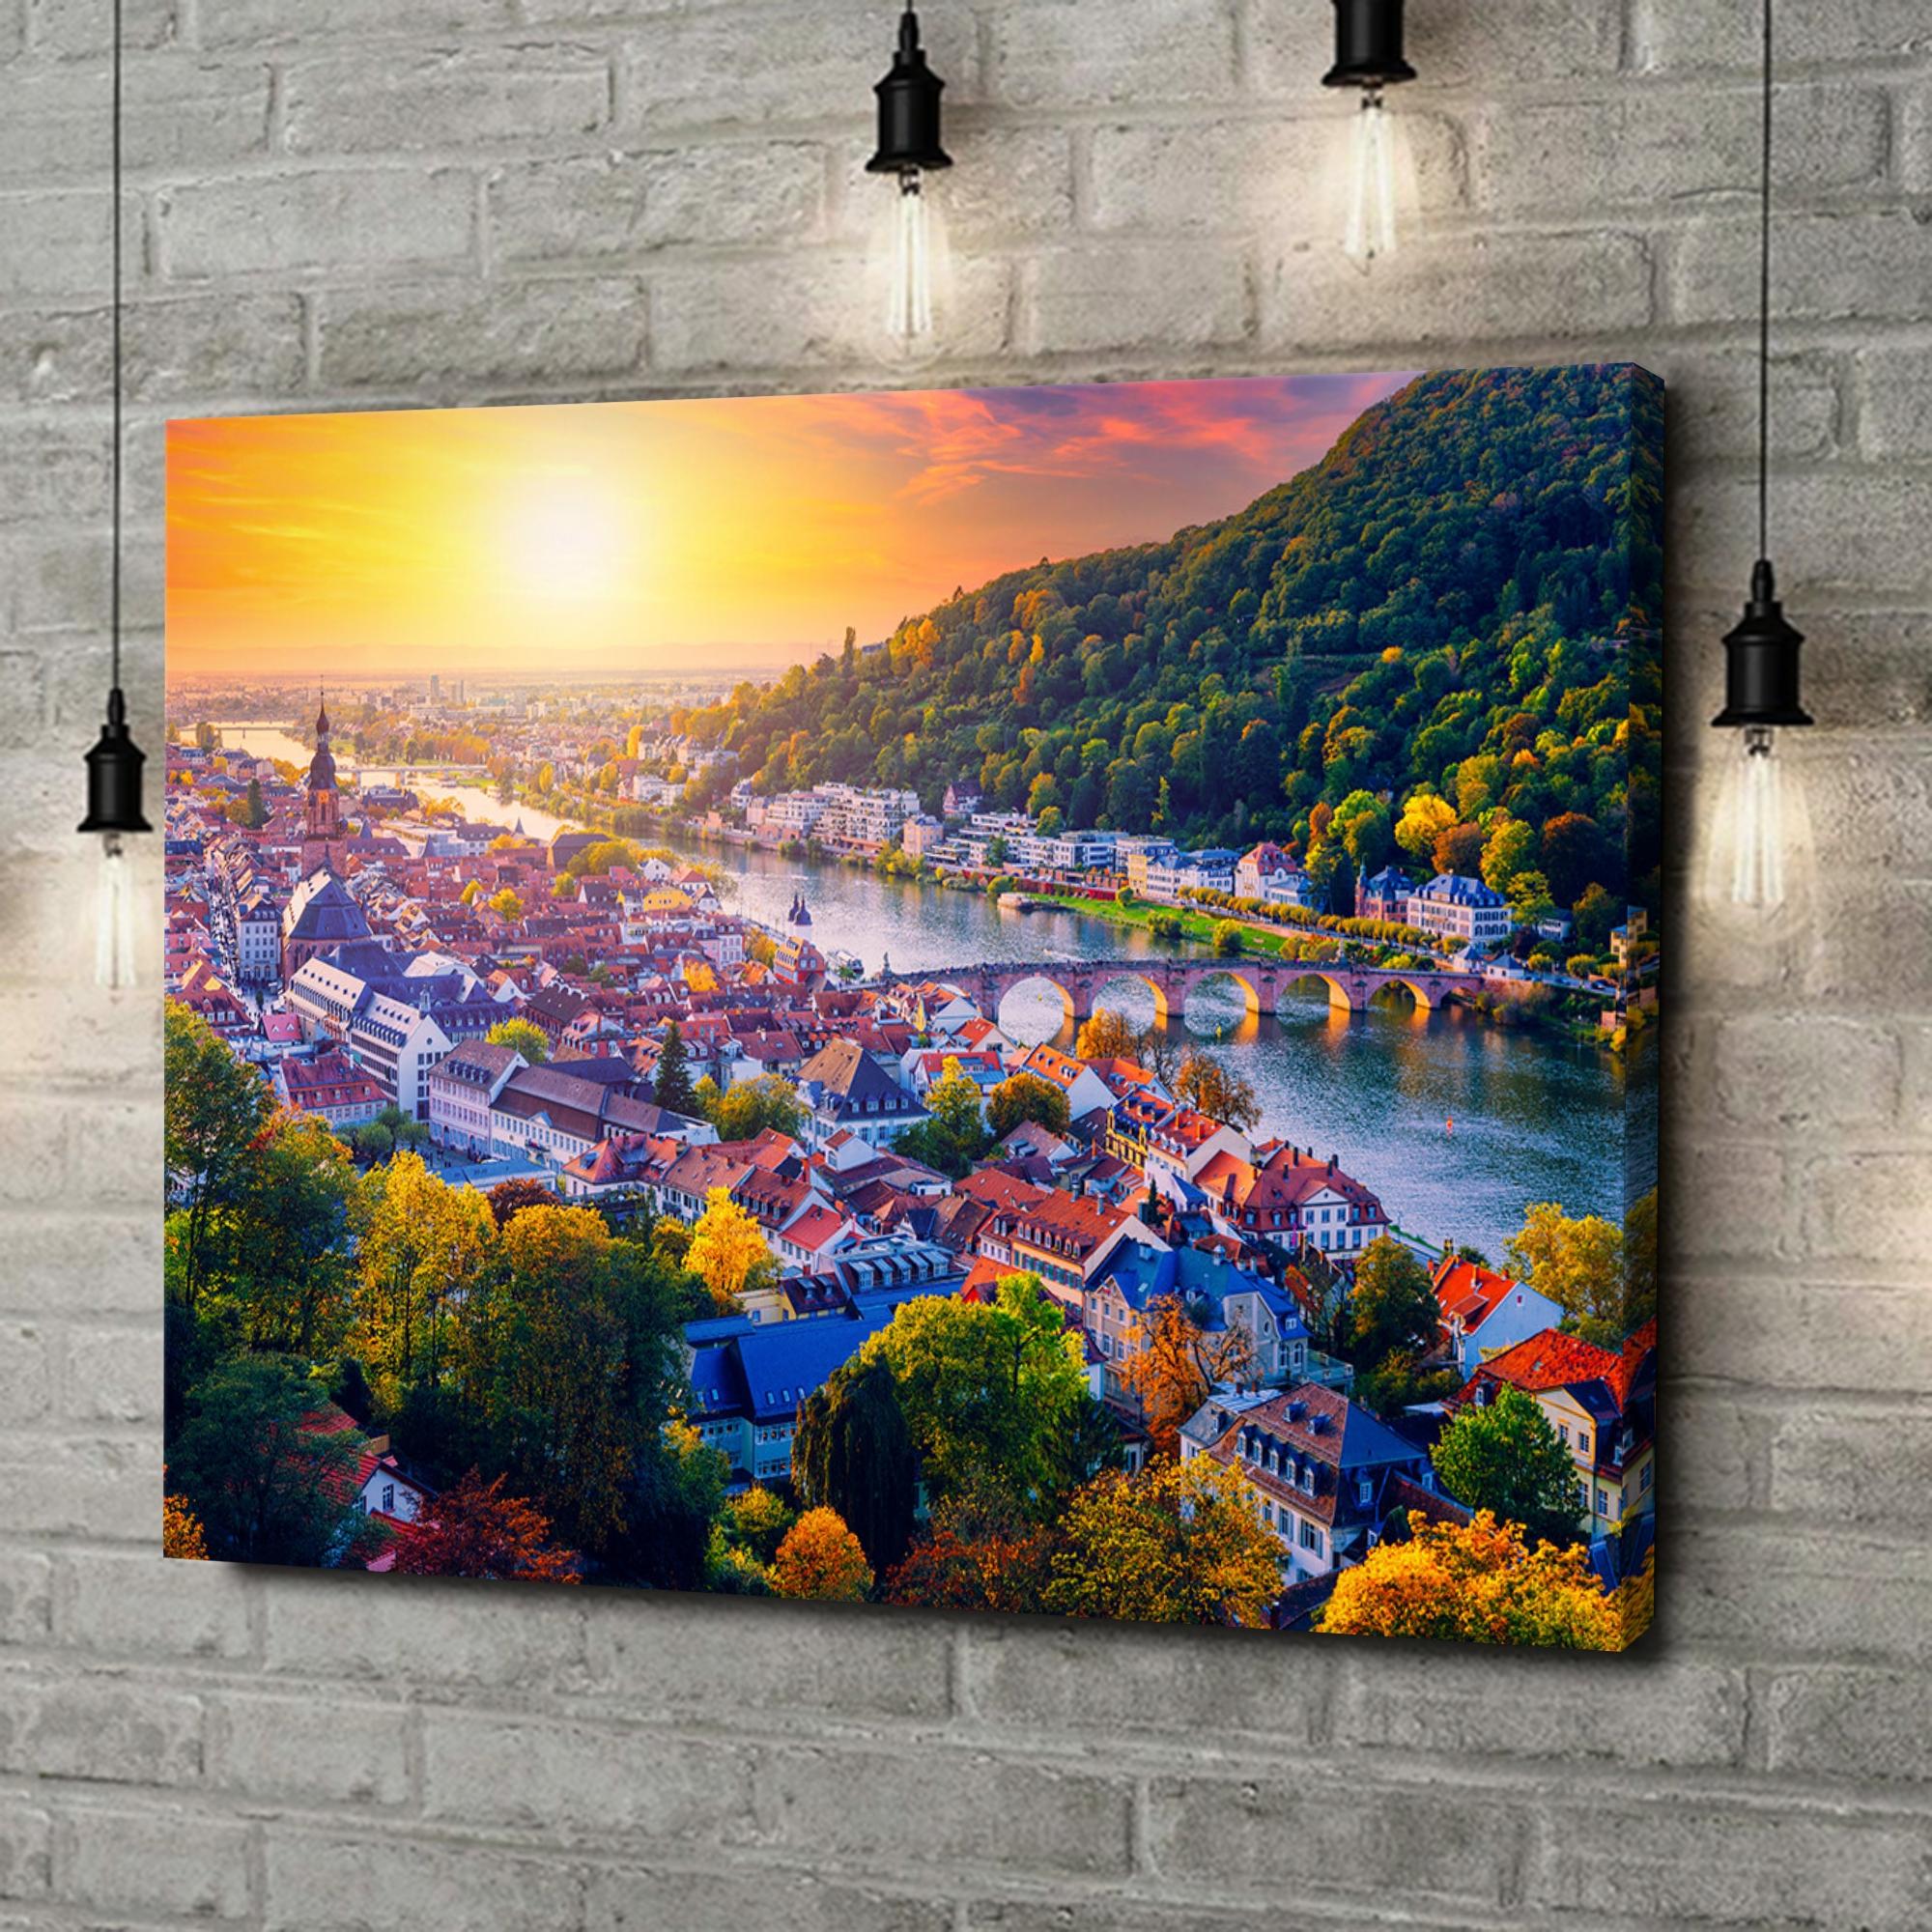 Leinwandbild personalisiert Skyline Heidelberg